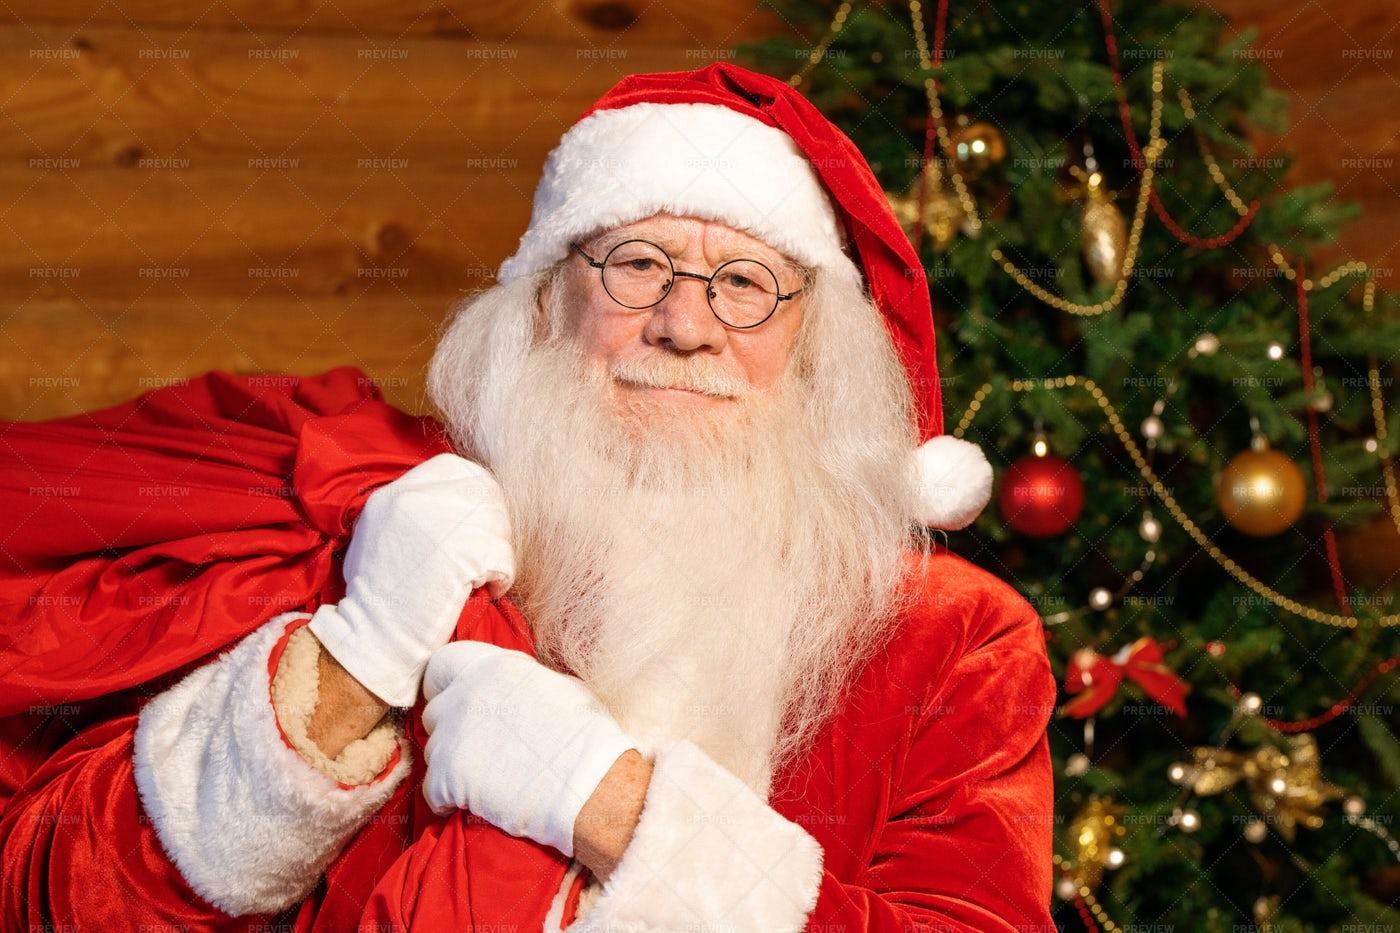 Santa In Traditional Costume, White...: Stock Photos